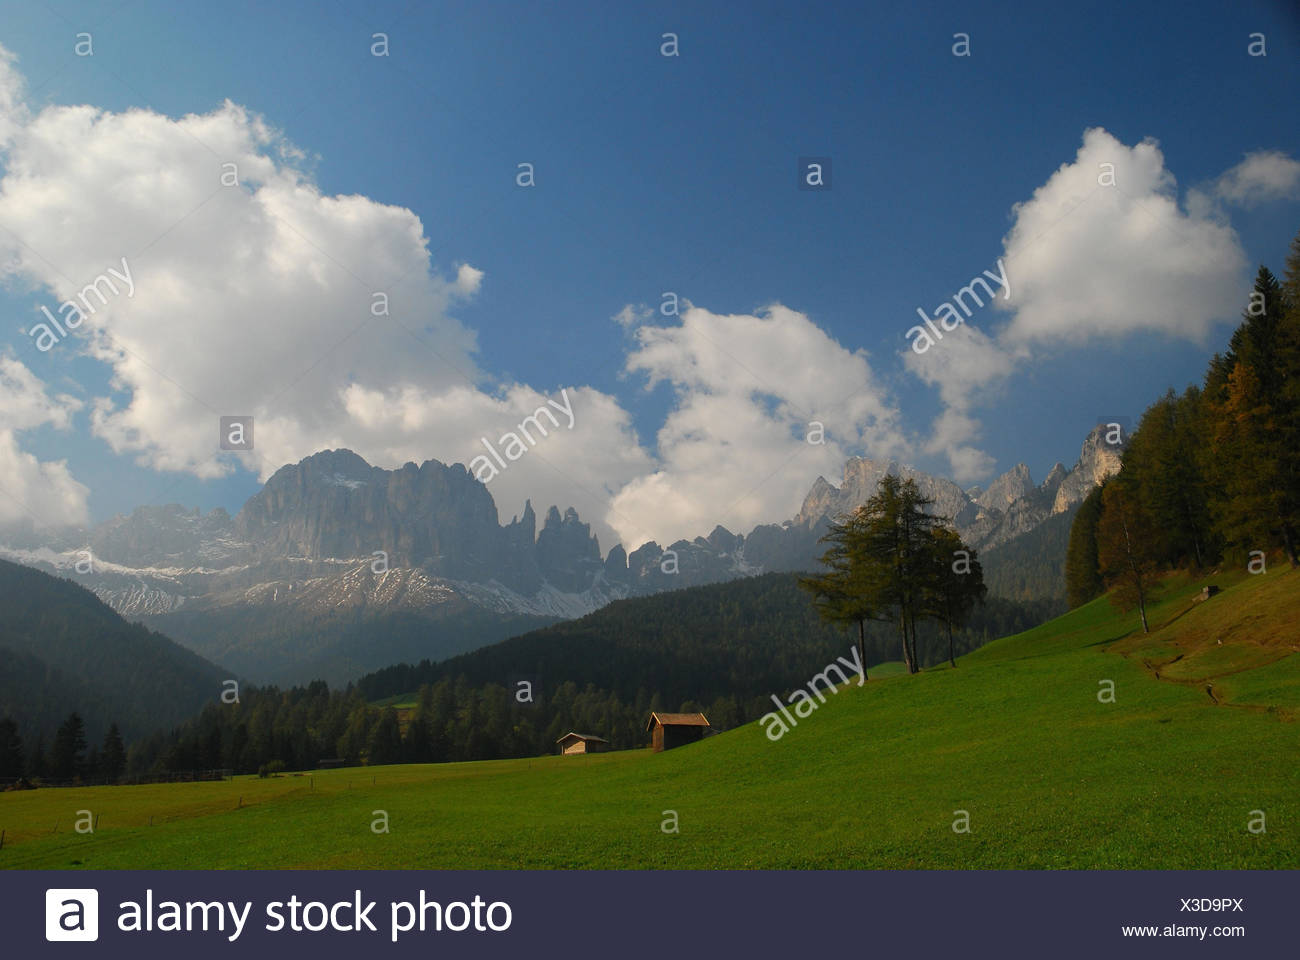 Italy,South Tirol,Tierser valley,St. Zyprian,the Dolomites,mountain pasture,rose garden,Vajolettürme,pert electrolytic capacitor gel, - Stock Image